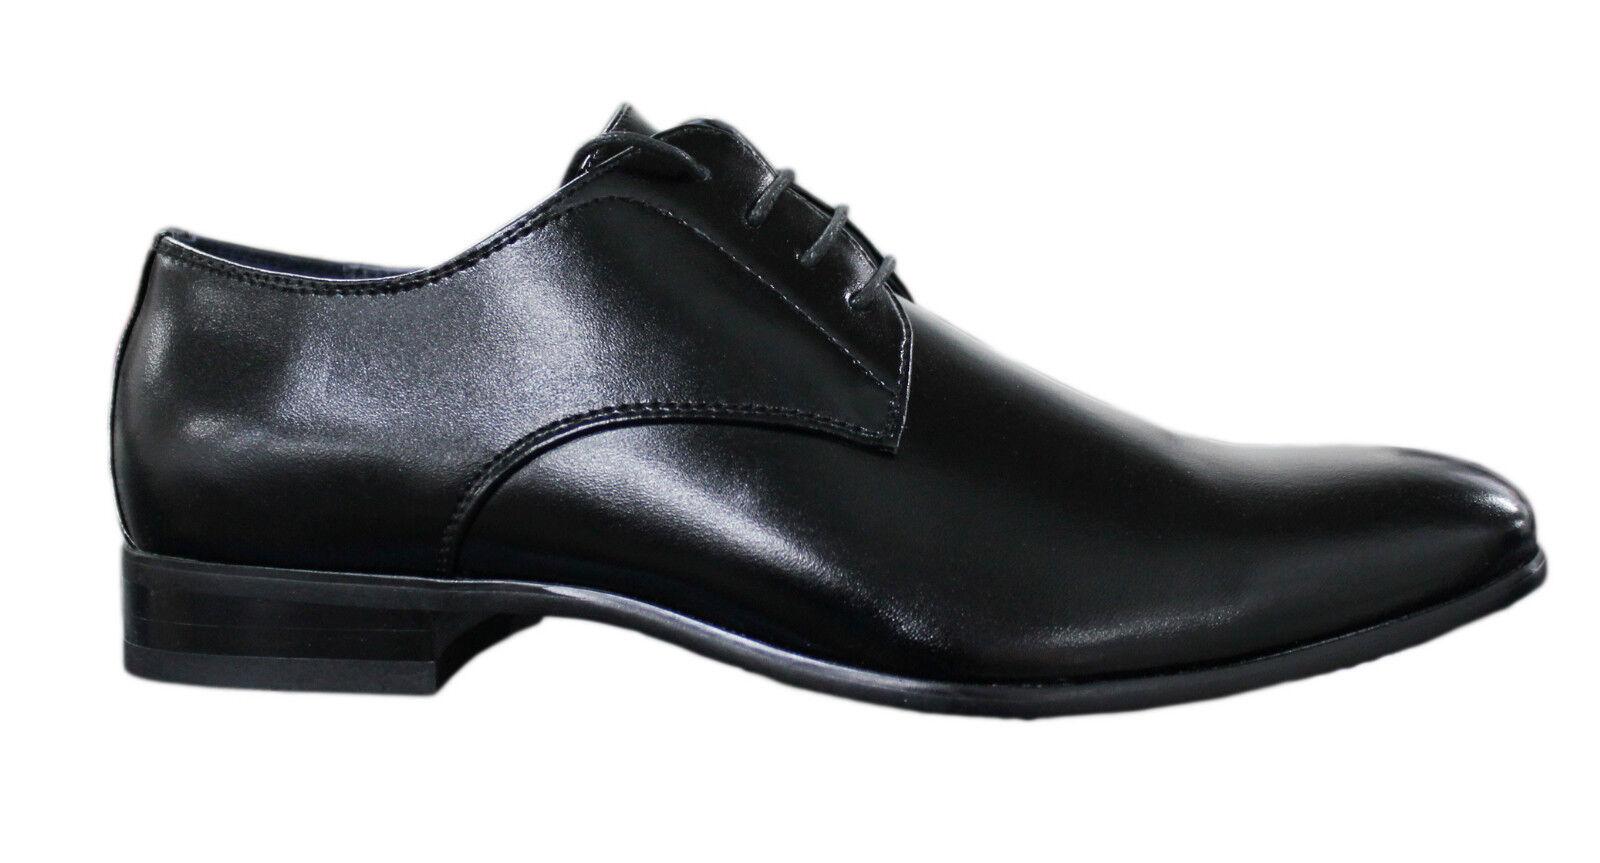 shoes men LINEA CLASSICA black ELEGANTI HIGH CLASS CERIMONIA num. da 39 a 45